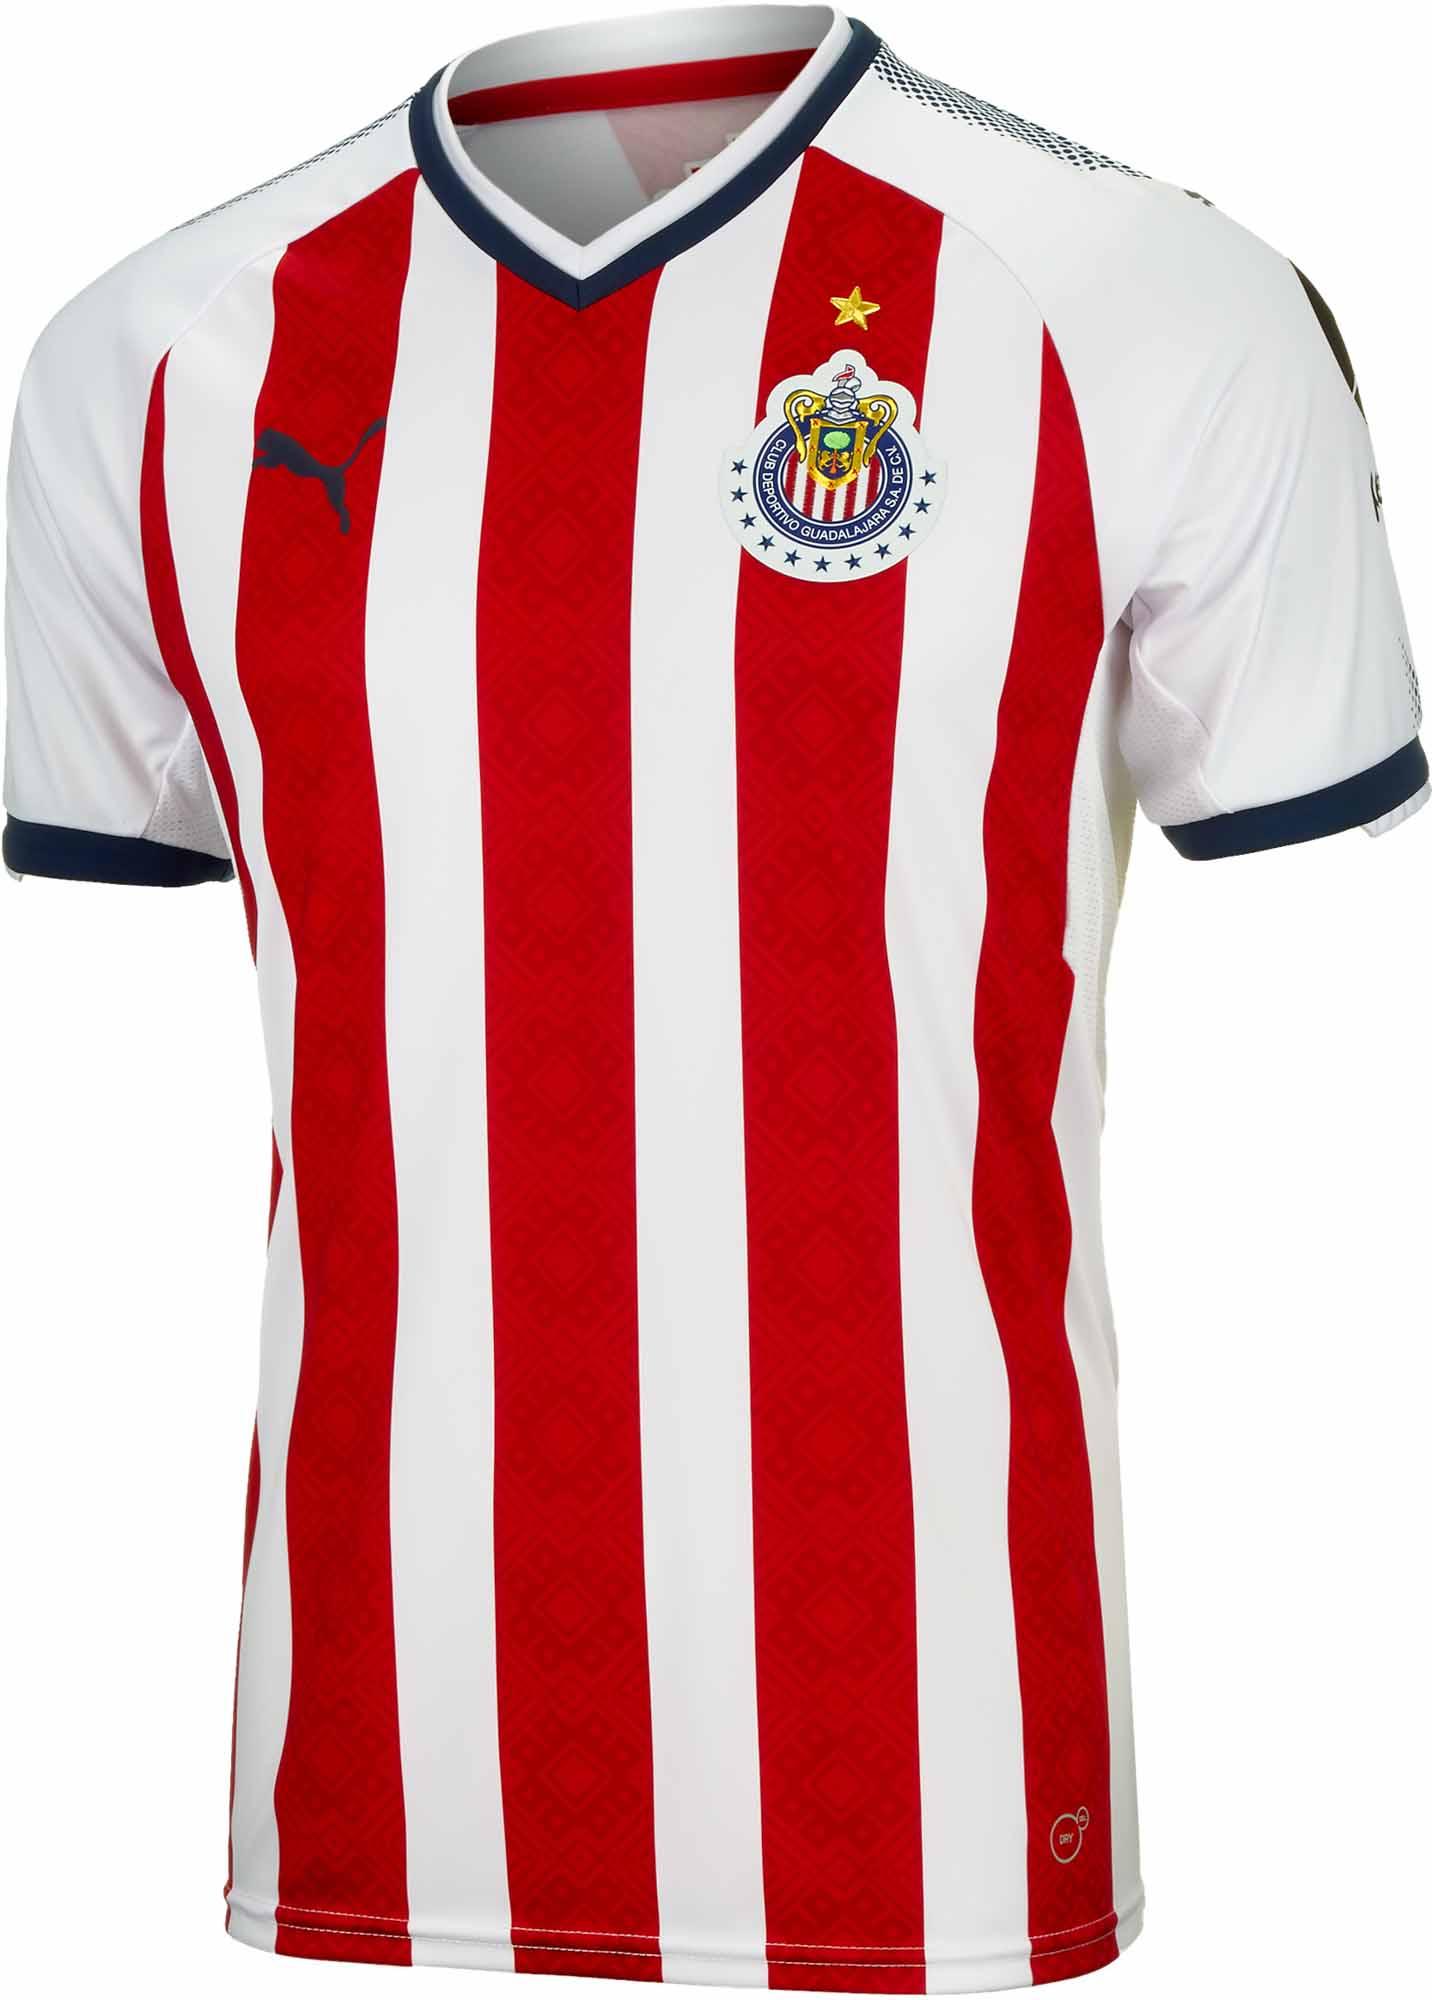 abfc7bbc9 Puma Chivas Home Jersey 2017-18 - Soccer Master